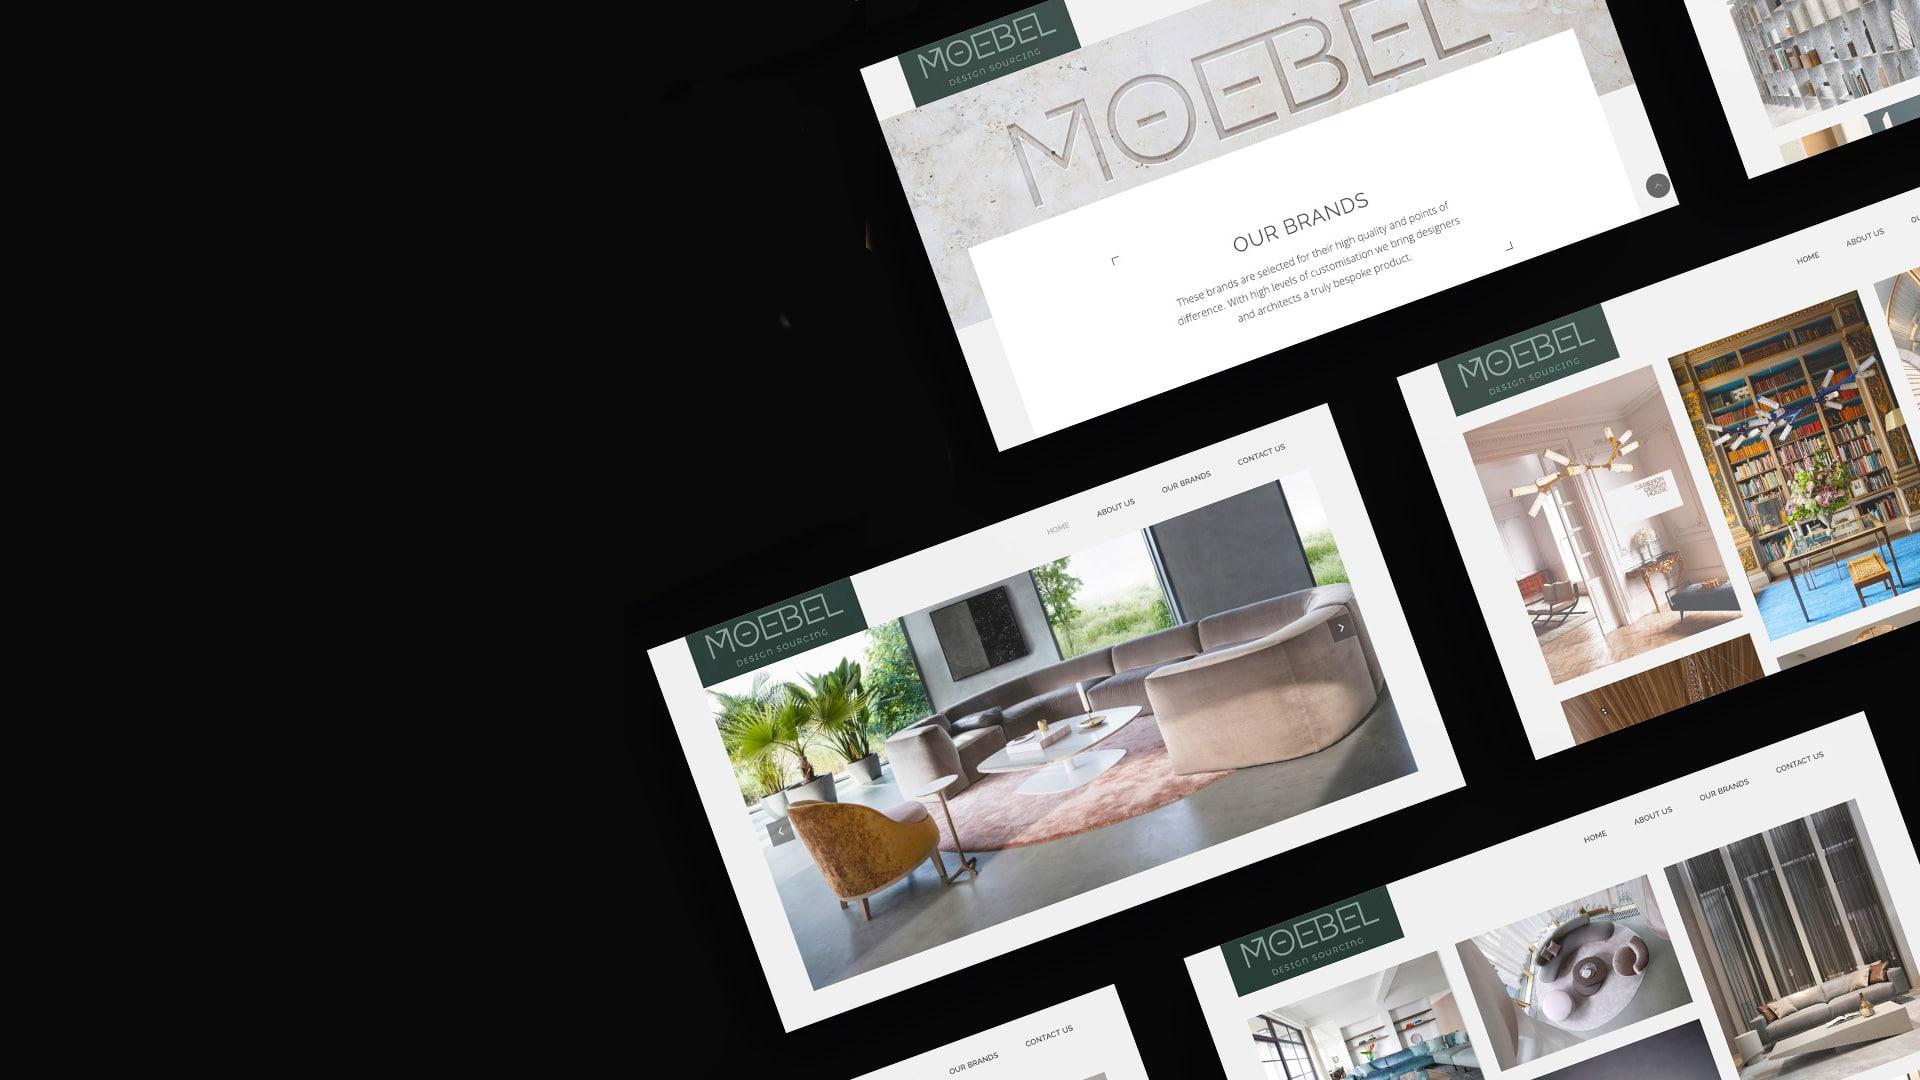 WEB DESIGN MOEBEL